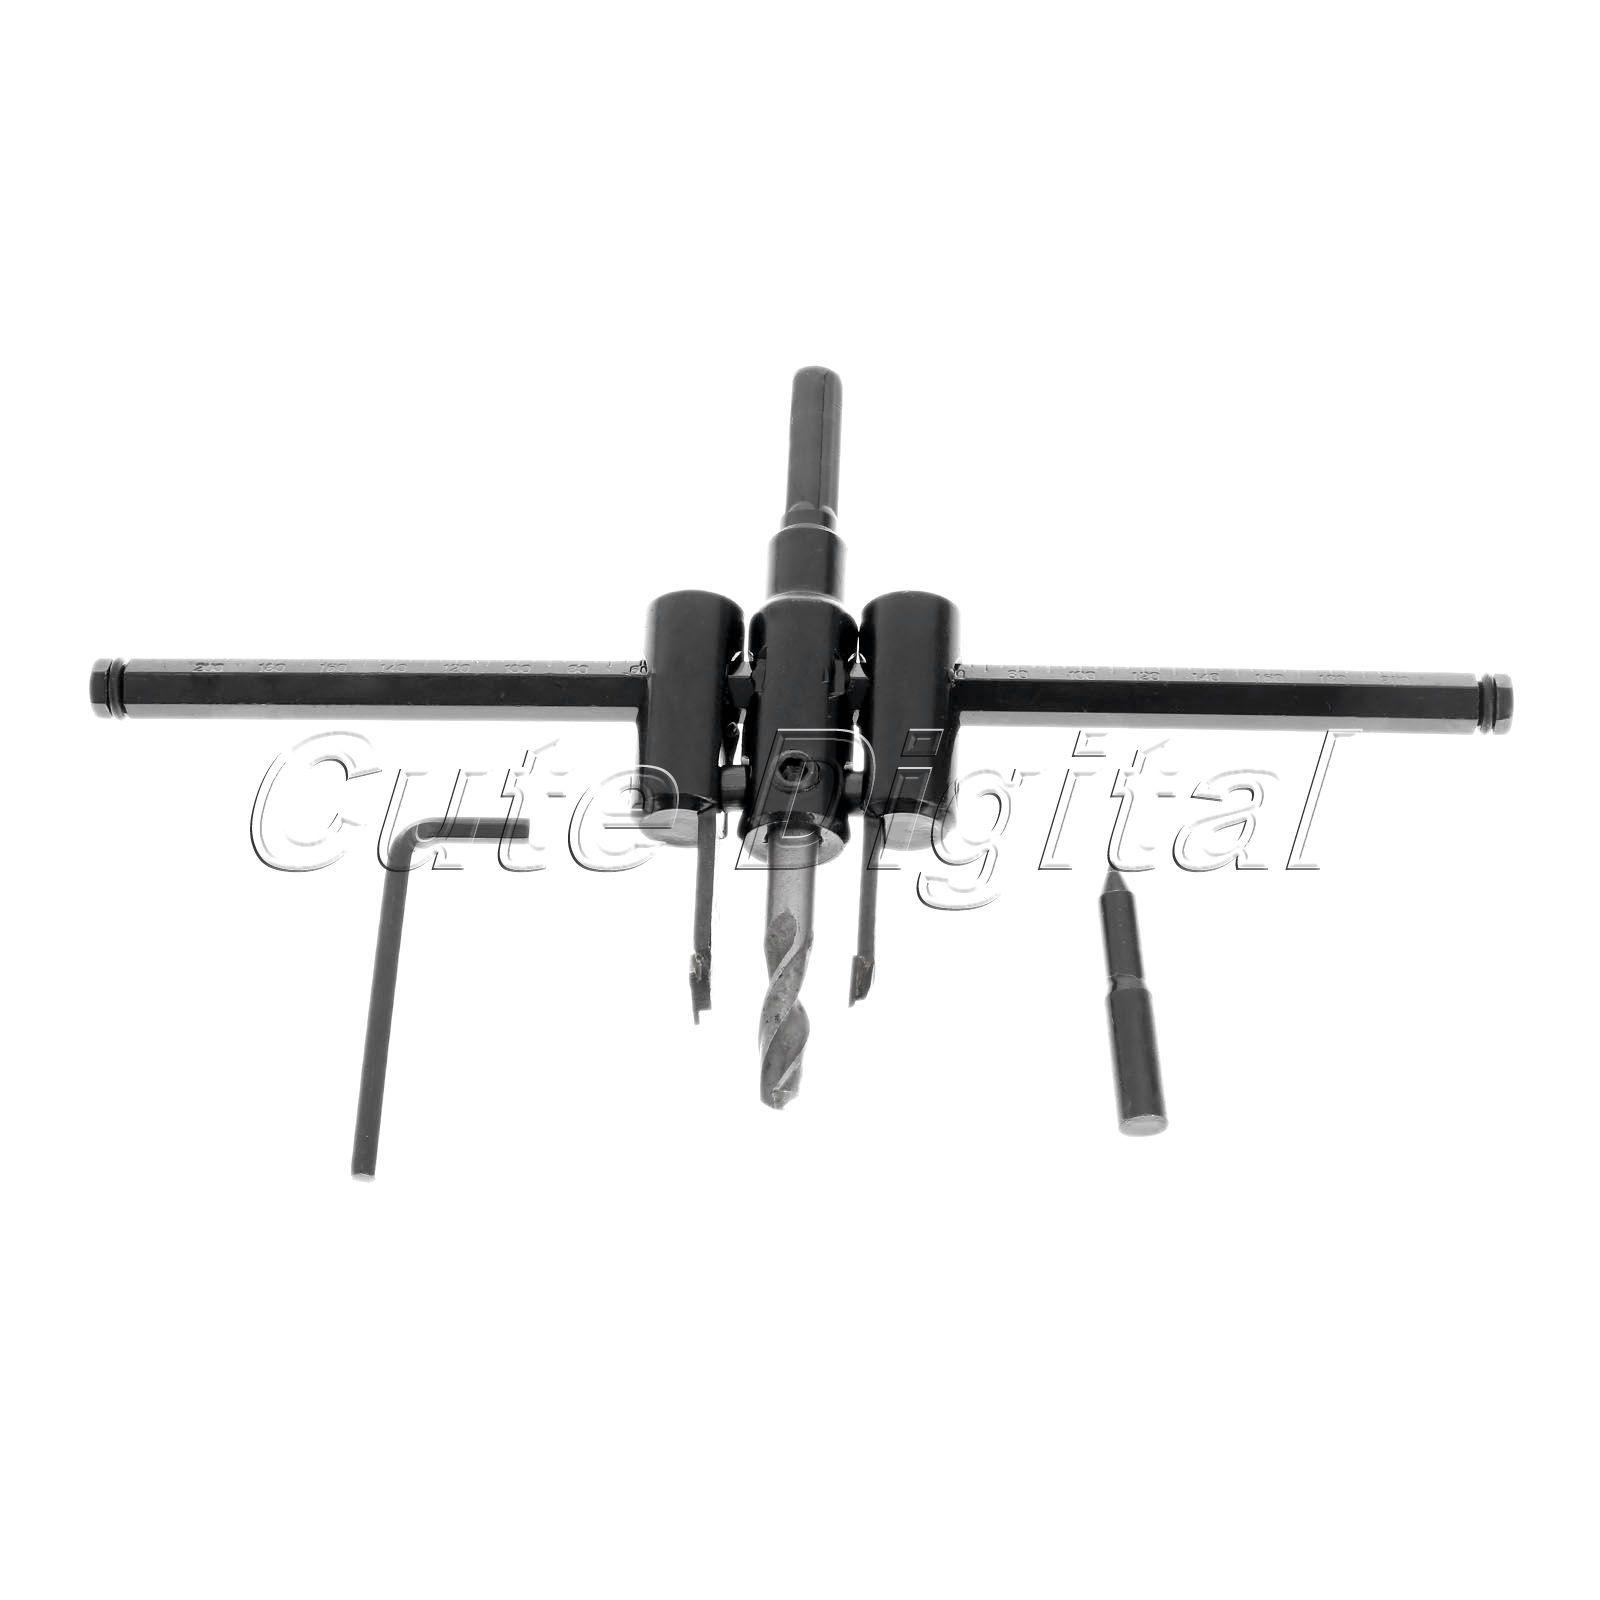 adjustable metal wood circle hole saw drill bit cutter kit